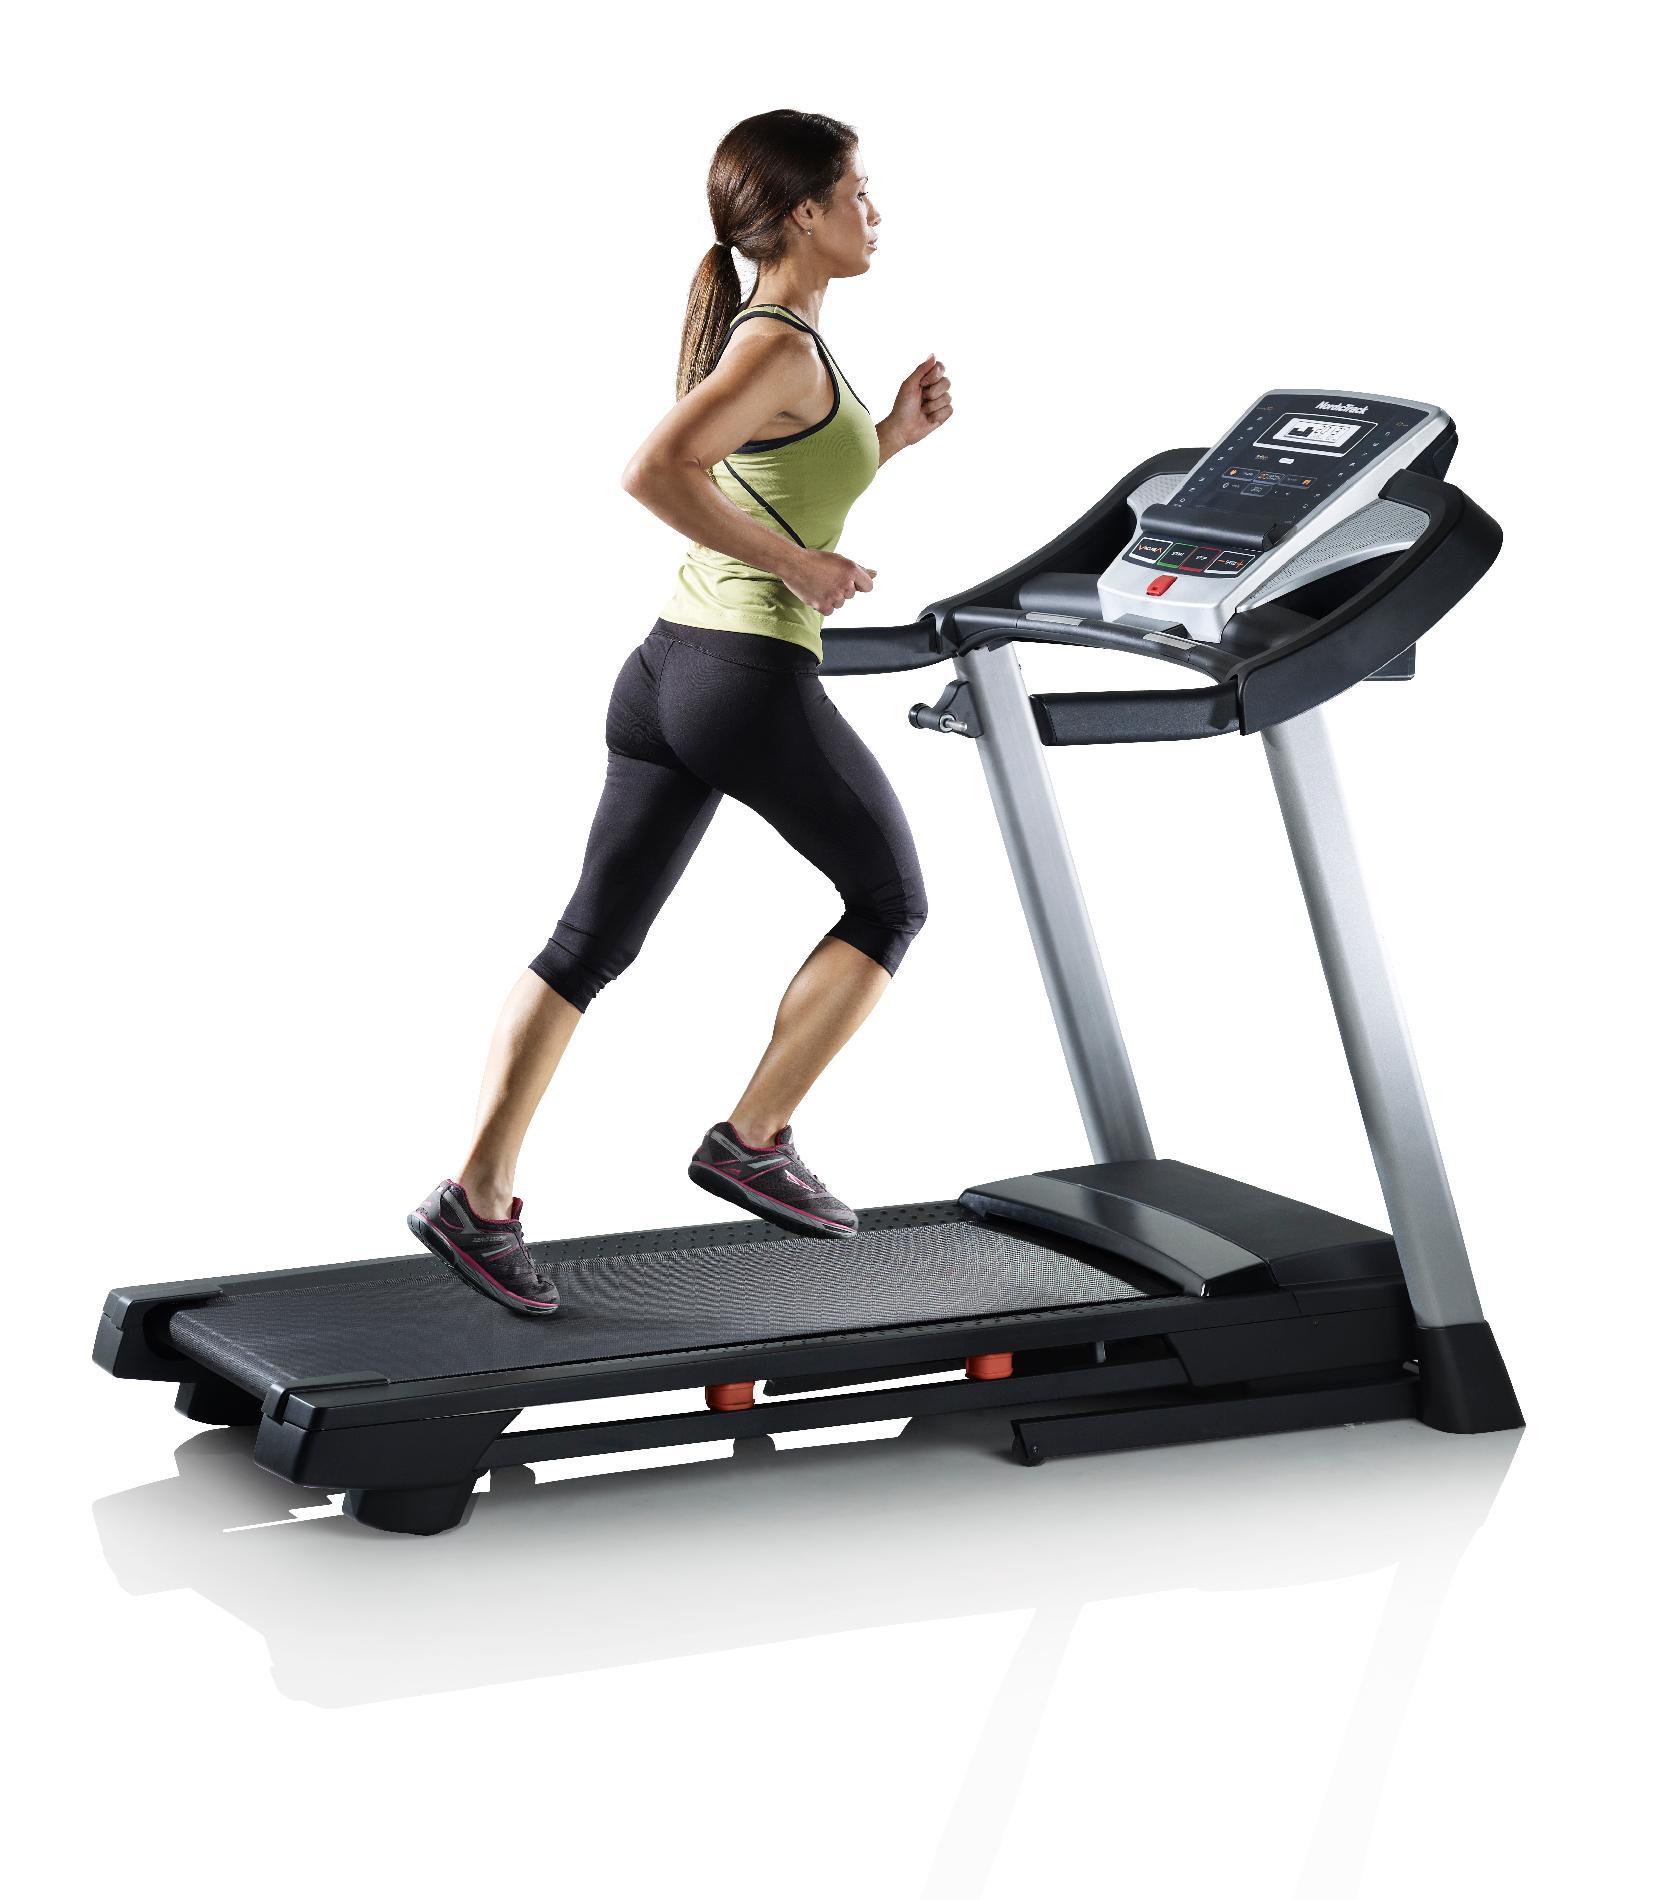 NordicTrack T6.3 Treadmill